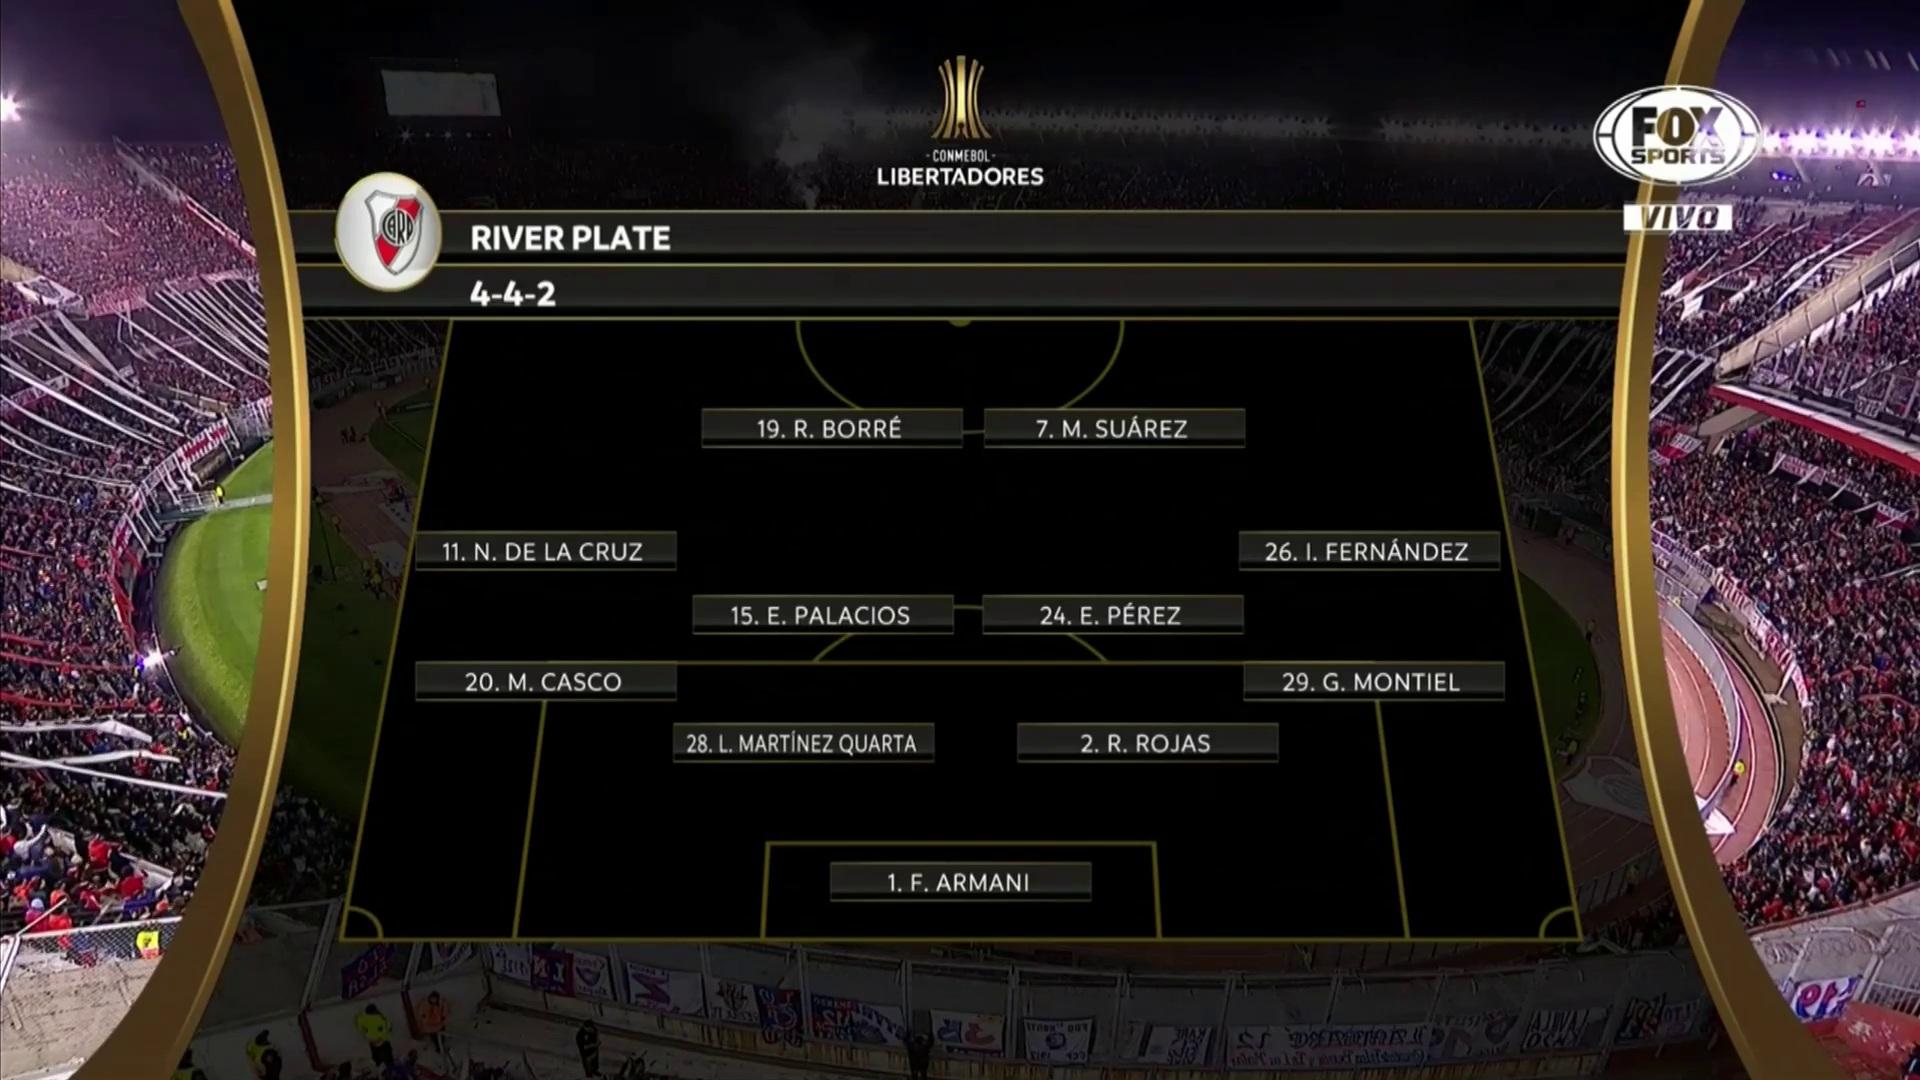 Copa Libertadores 2019 - Cuartos de Final - Ida - River Plate Vs. Cerro Porteño (1080p) (Español Latino) 220